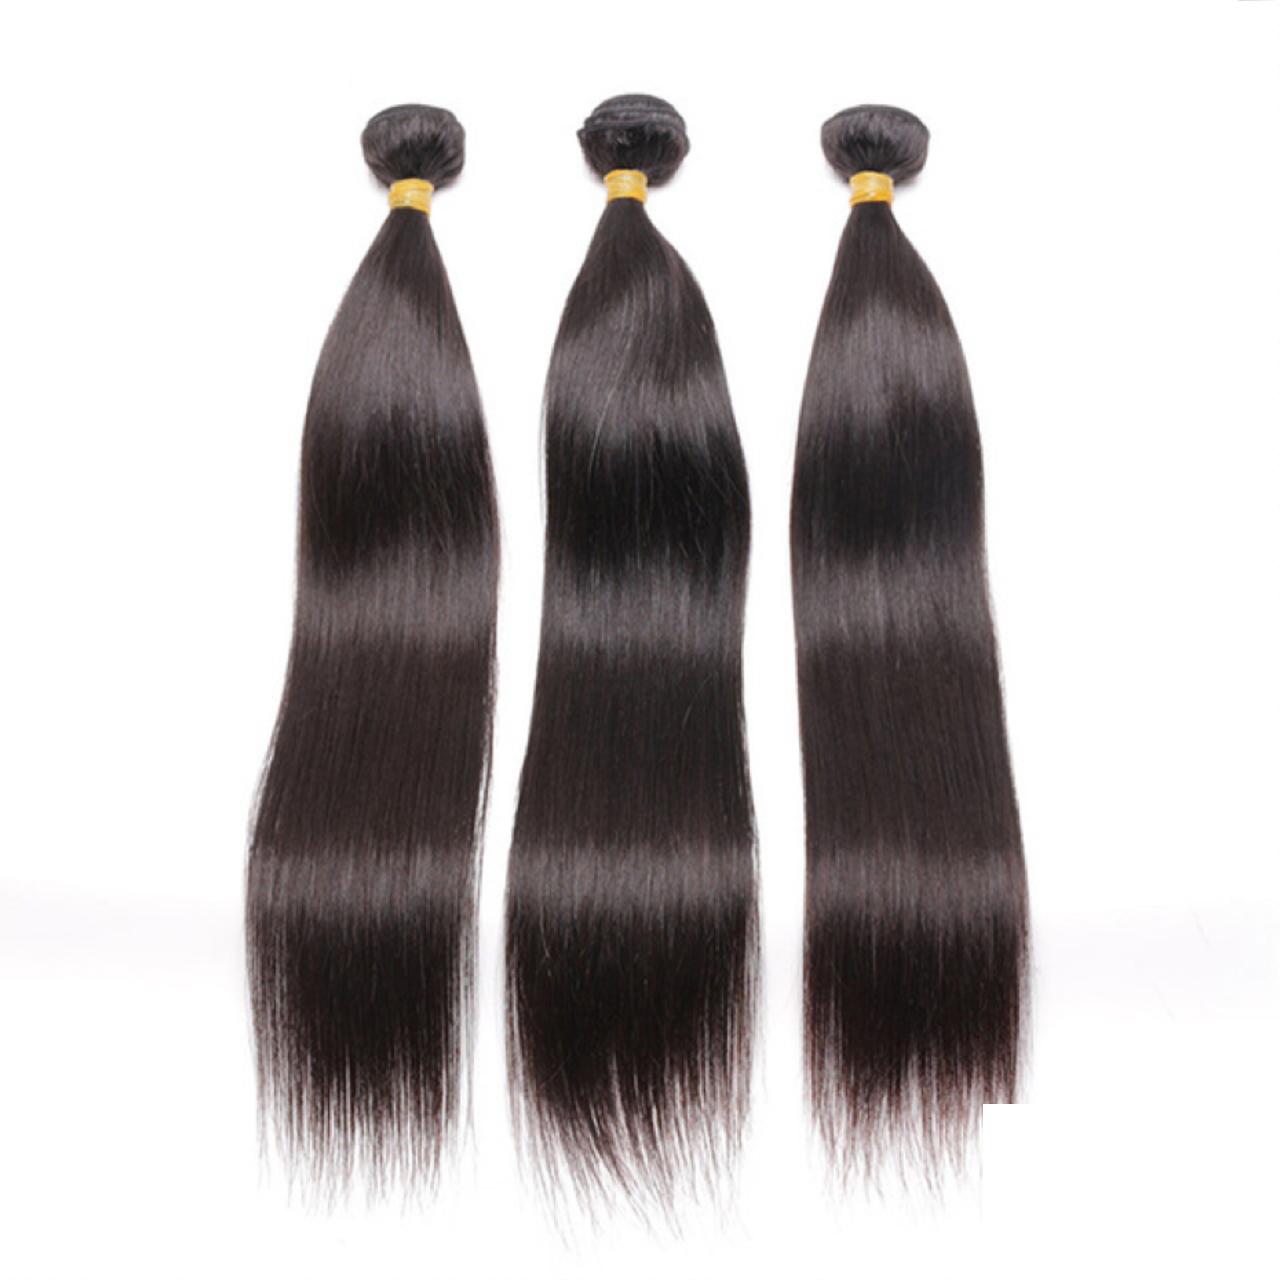 Image of Malaysian Silky Straight